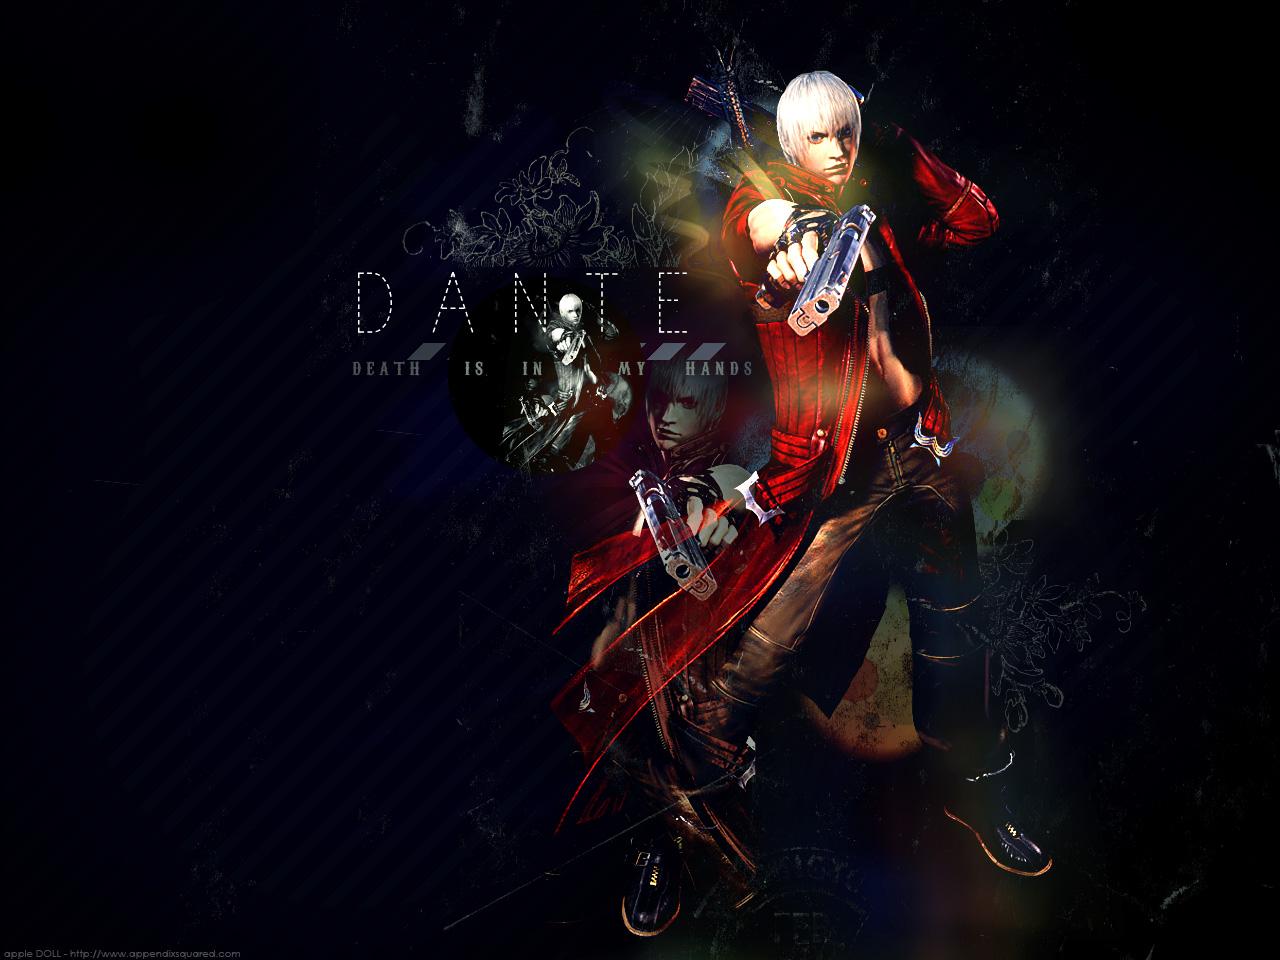 Devil May Cry Dante Wallpaper: DMC Devil May Cry Wallpaper